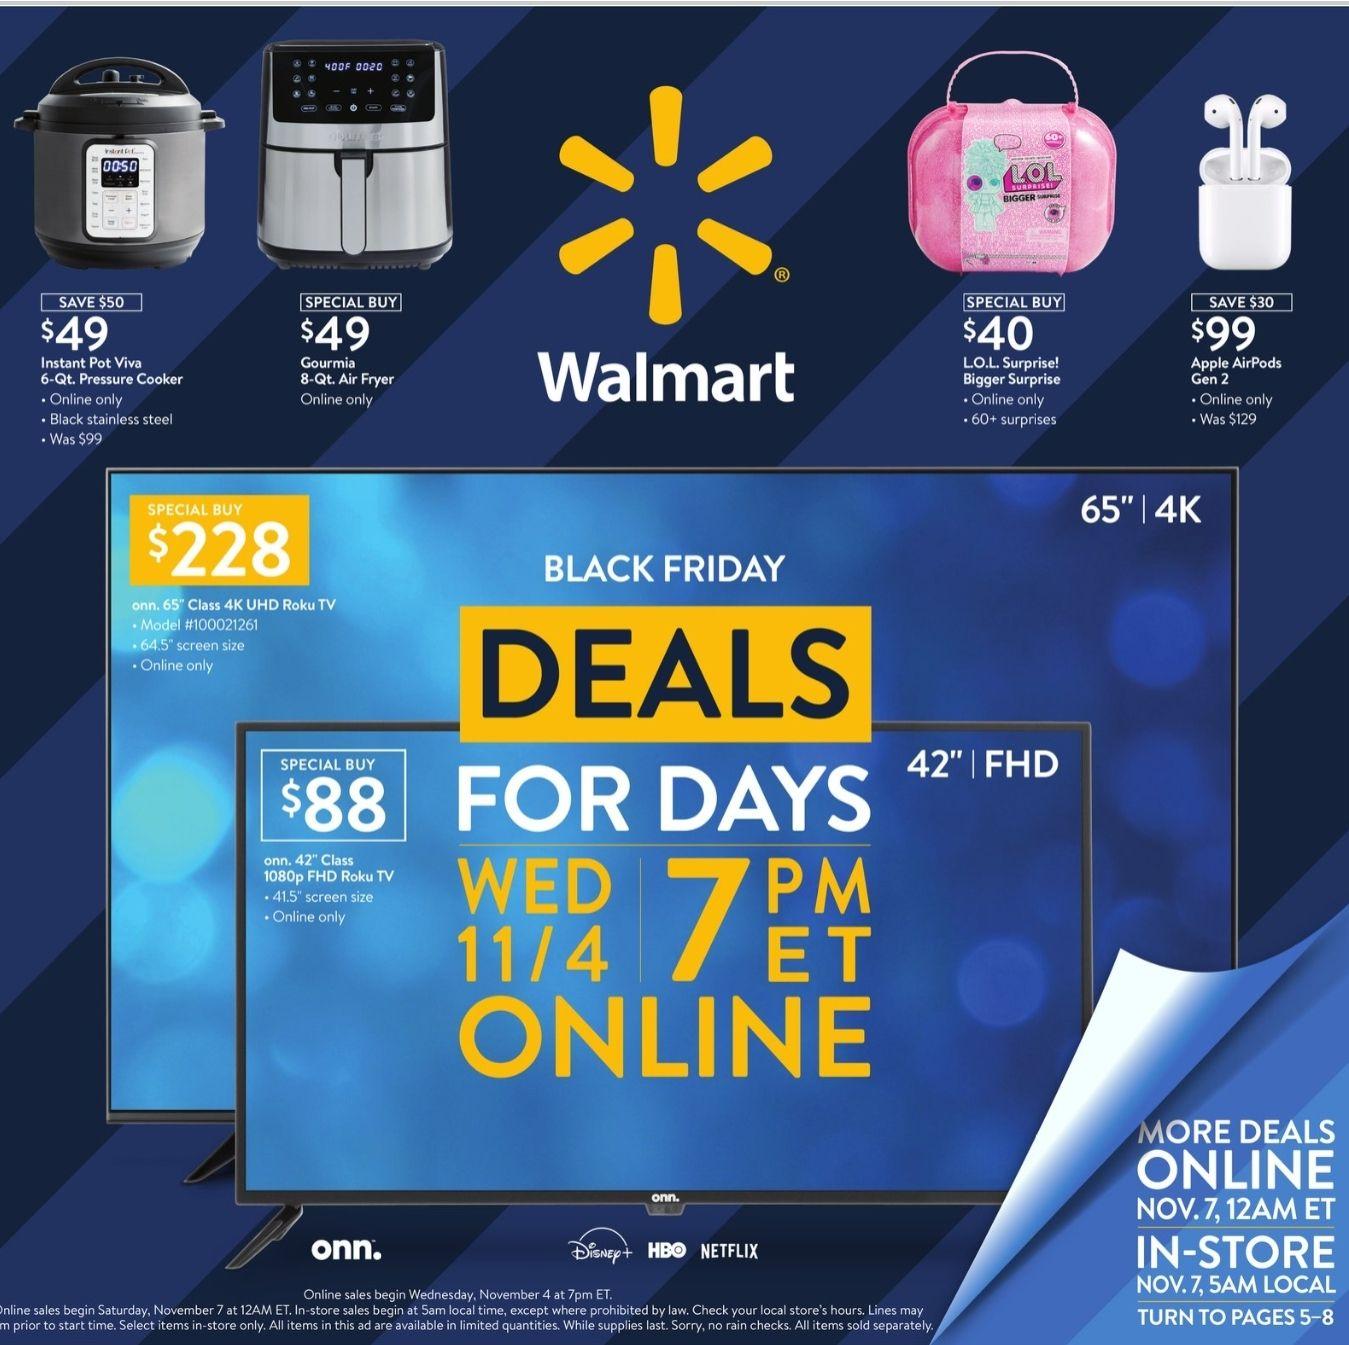 Sisterssavingucents Walmart Black Friday Ads Live In 2020 Walmart Black Friday Ad Black Friday Walmart Black Friday Ads